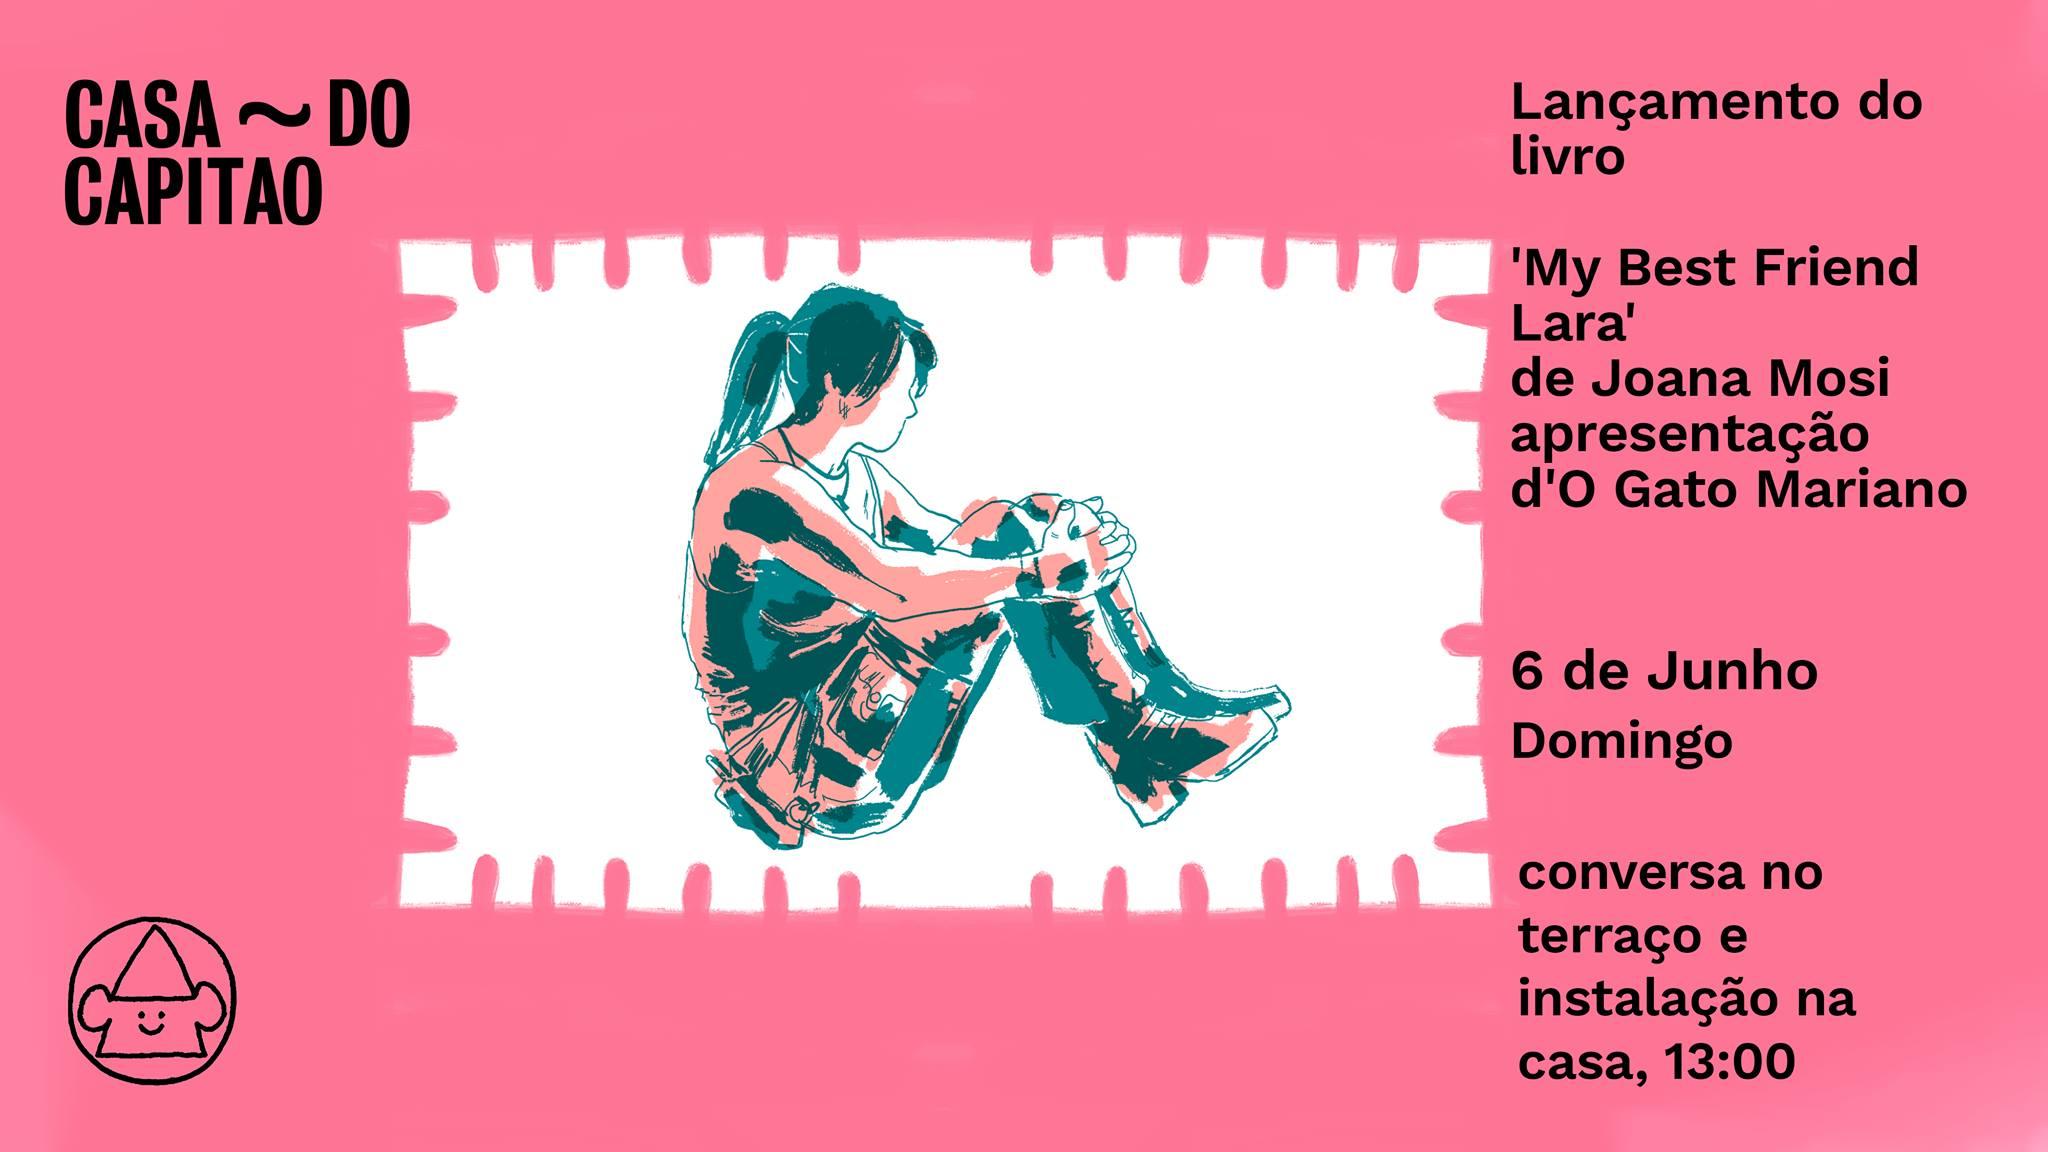 Lançamento de 'My Best Friend Lara' de Joana Mosi